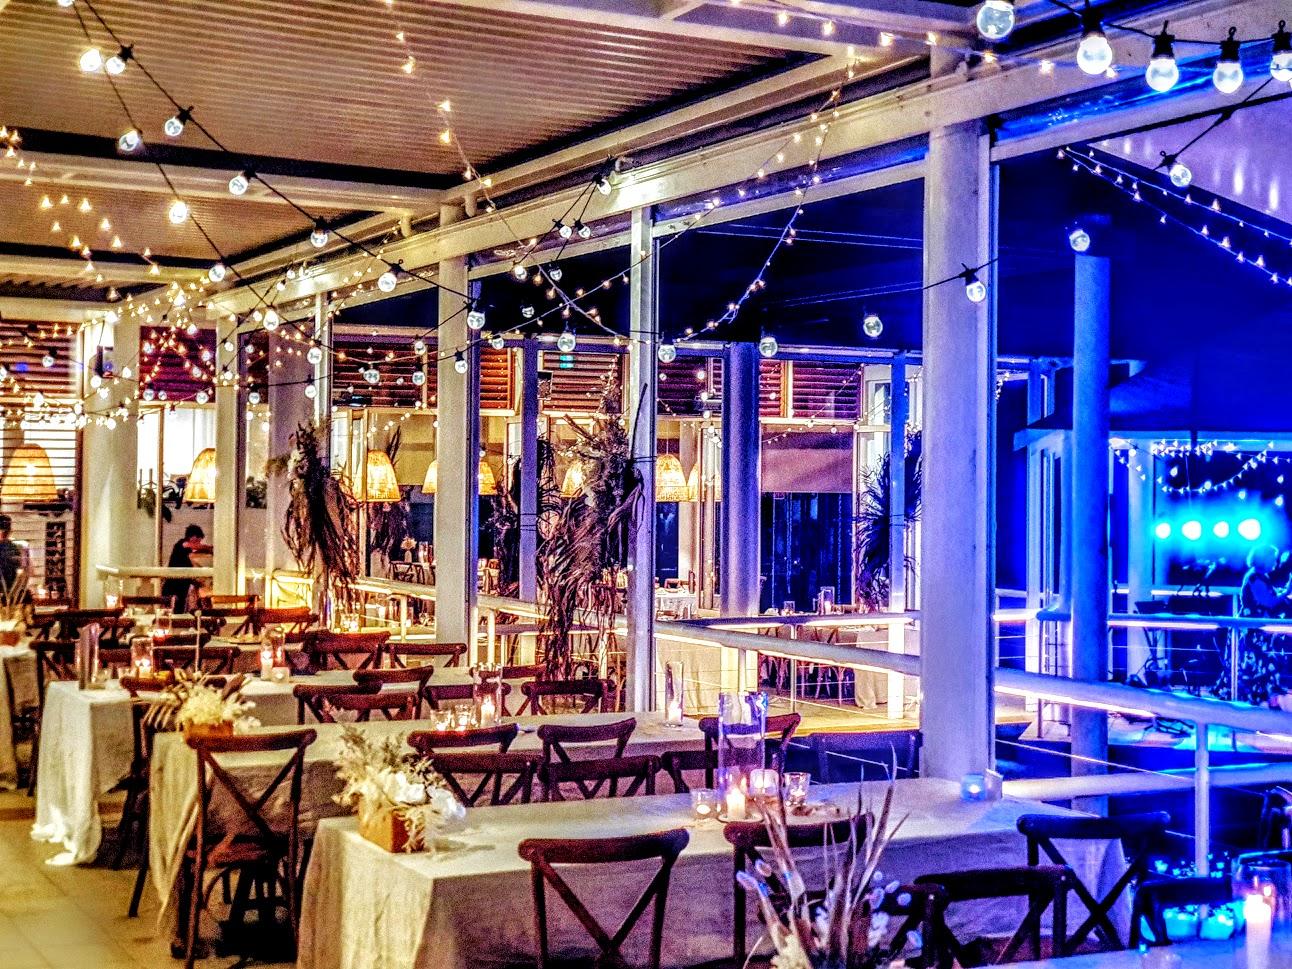 Festoon Fairy Lights Brown Hampton Chairs Bay side Restaurant